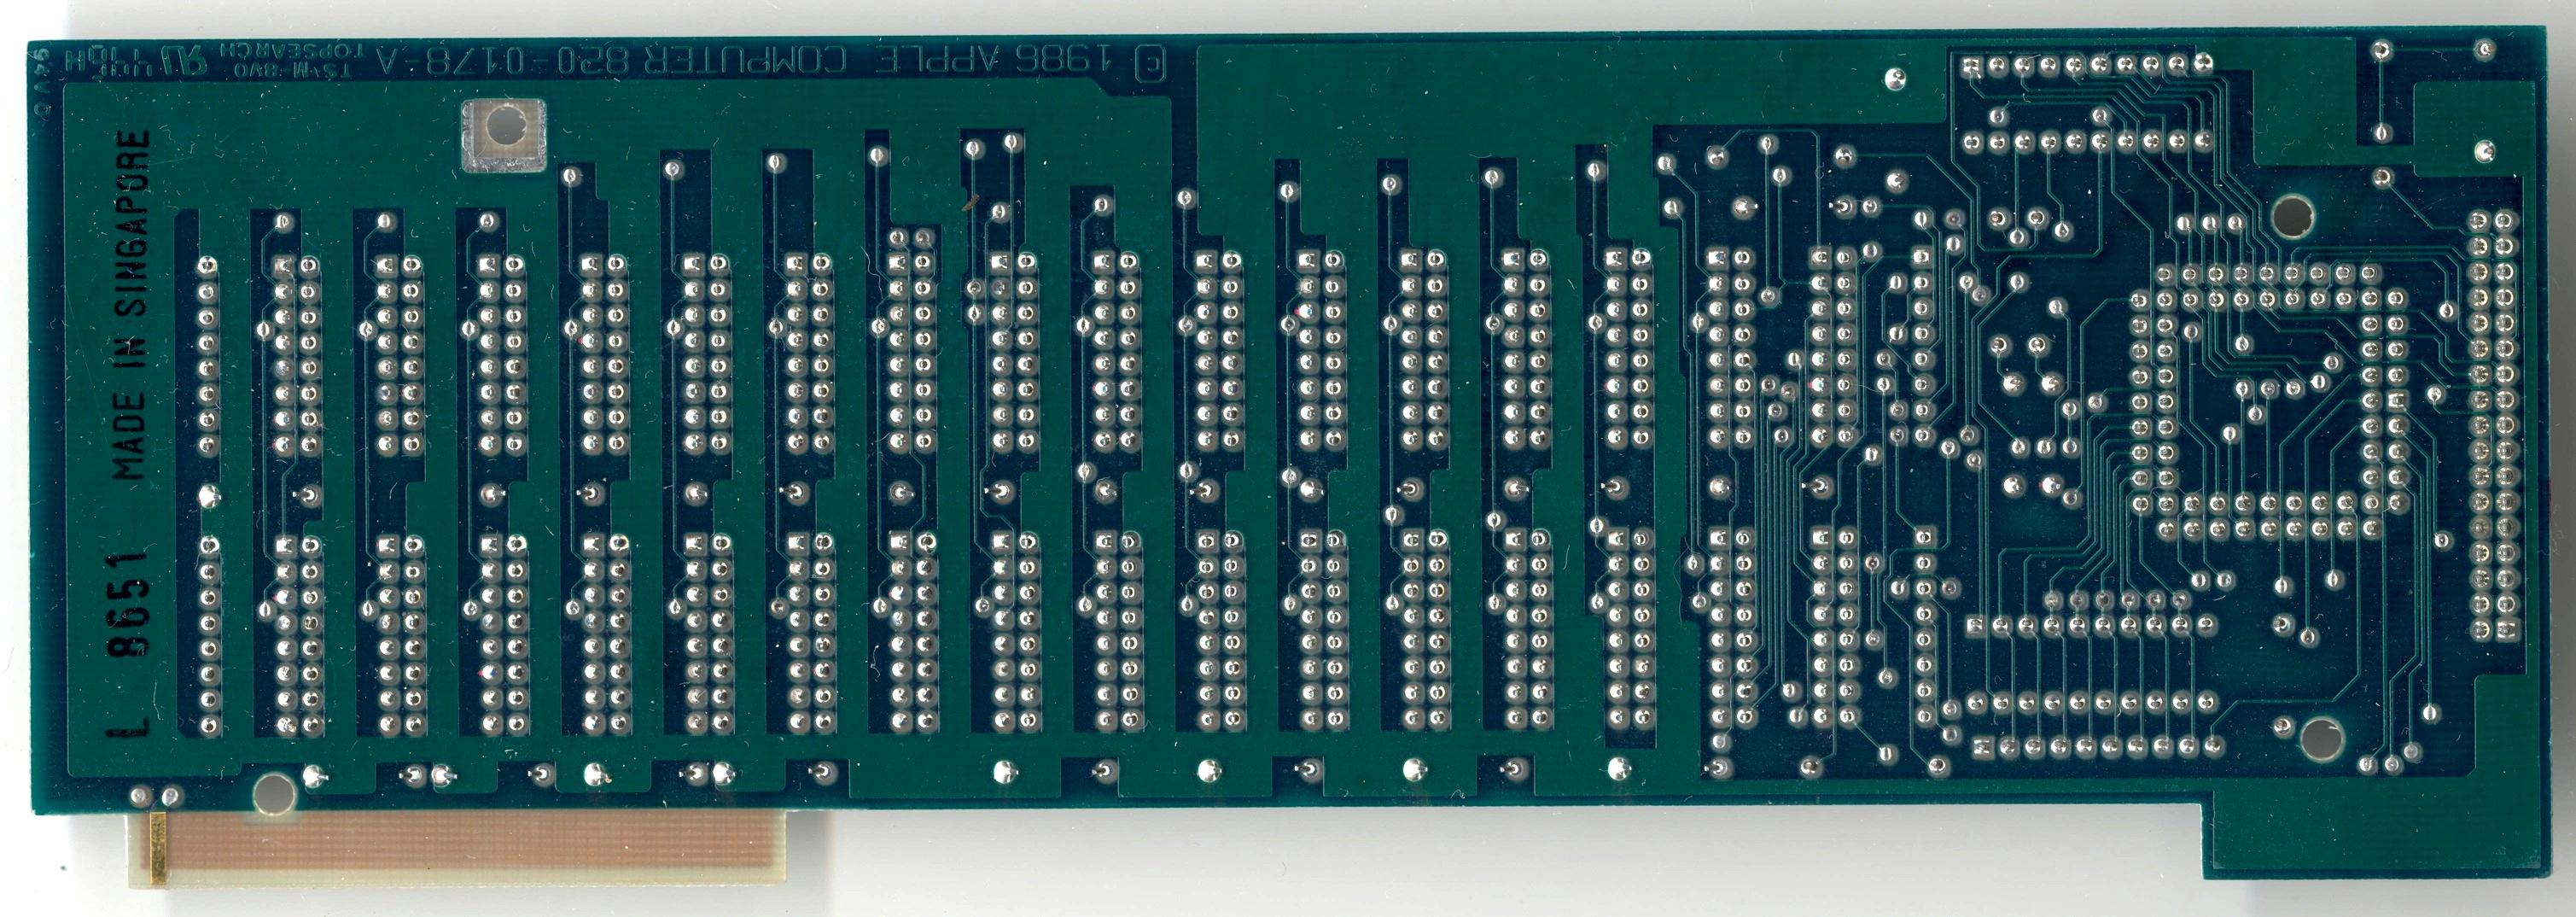 Apple IIc Memory Expansion Card